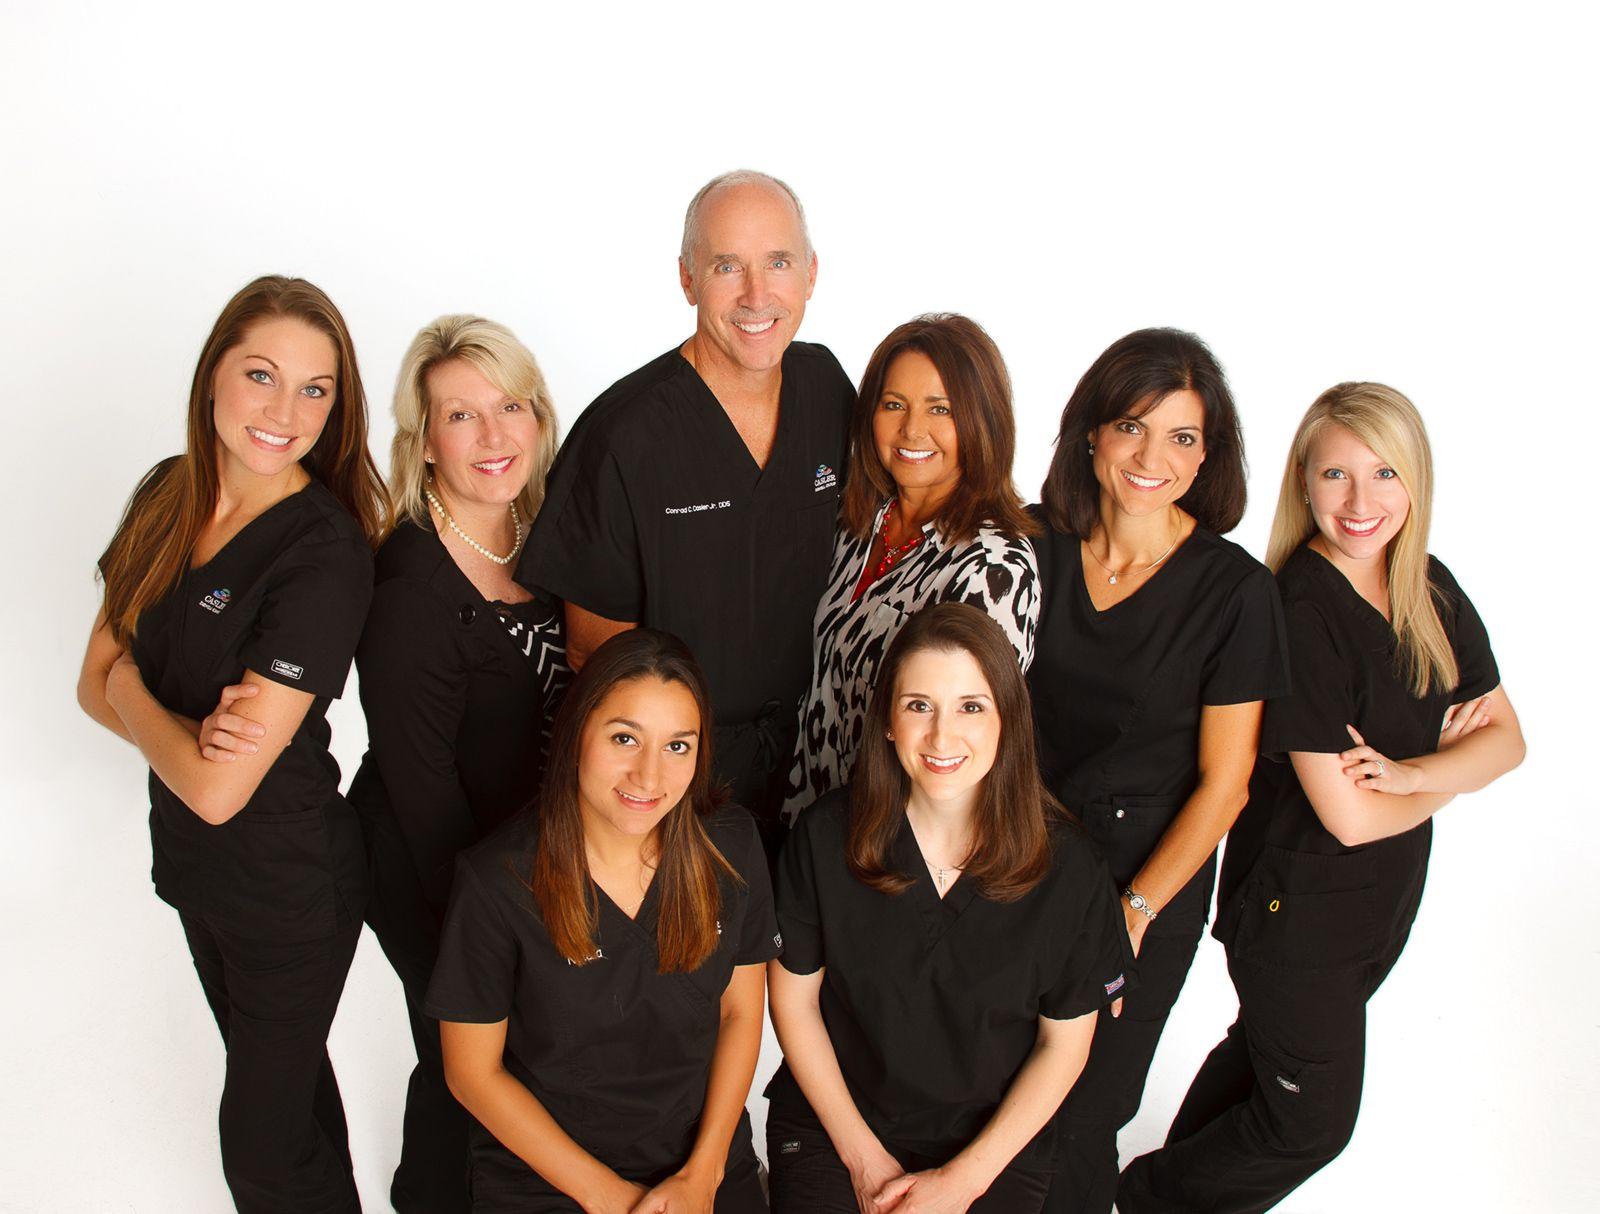 Casler Dental Group of Tulsa, OK